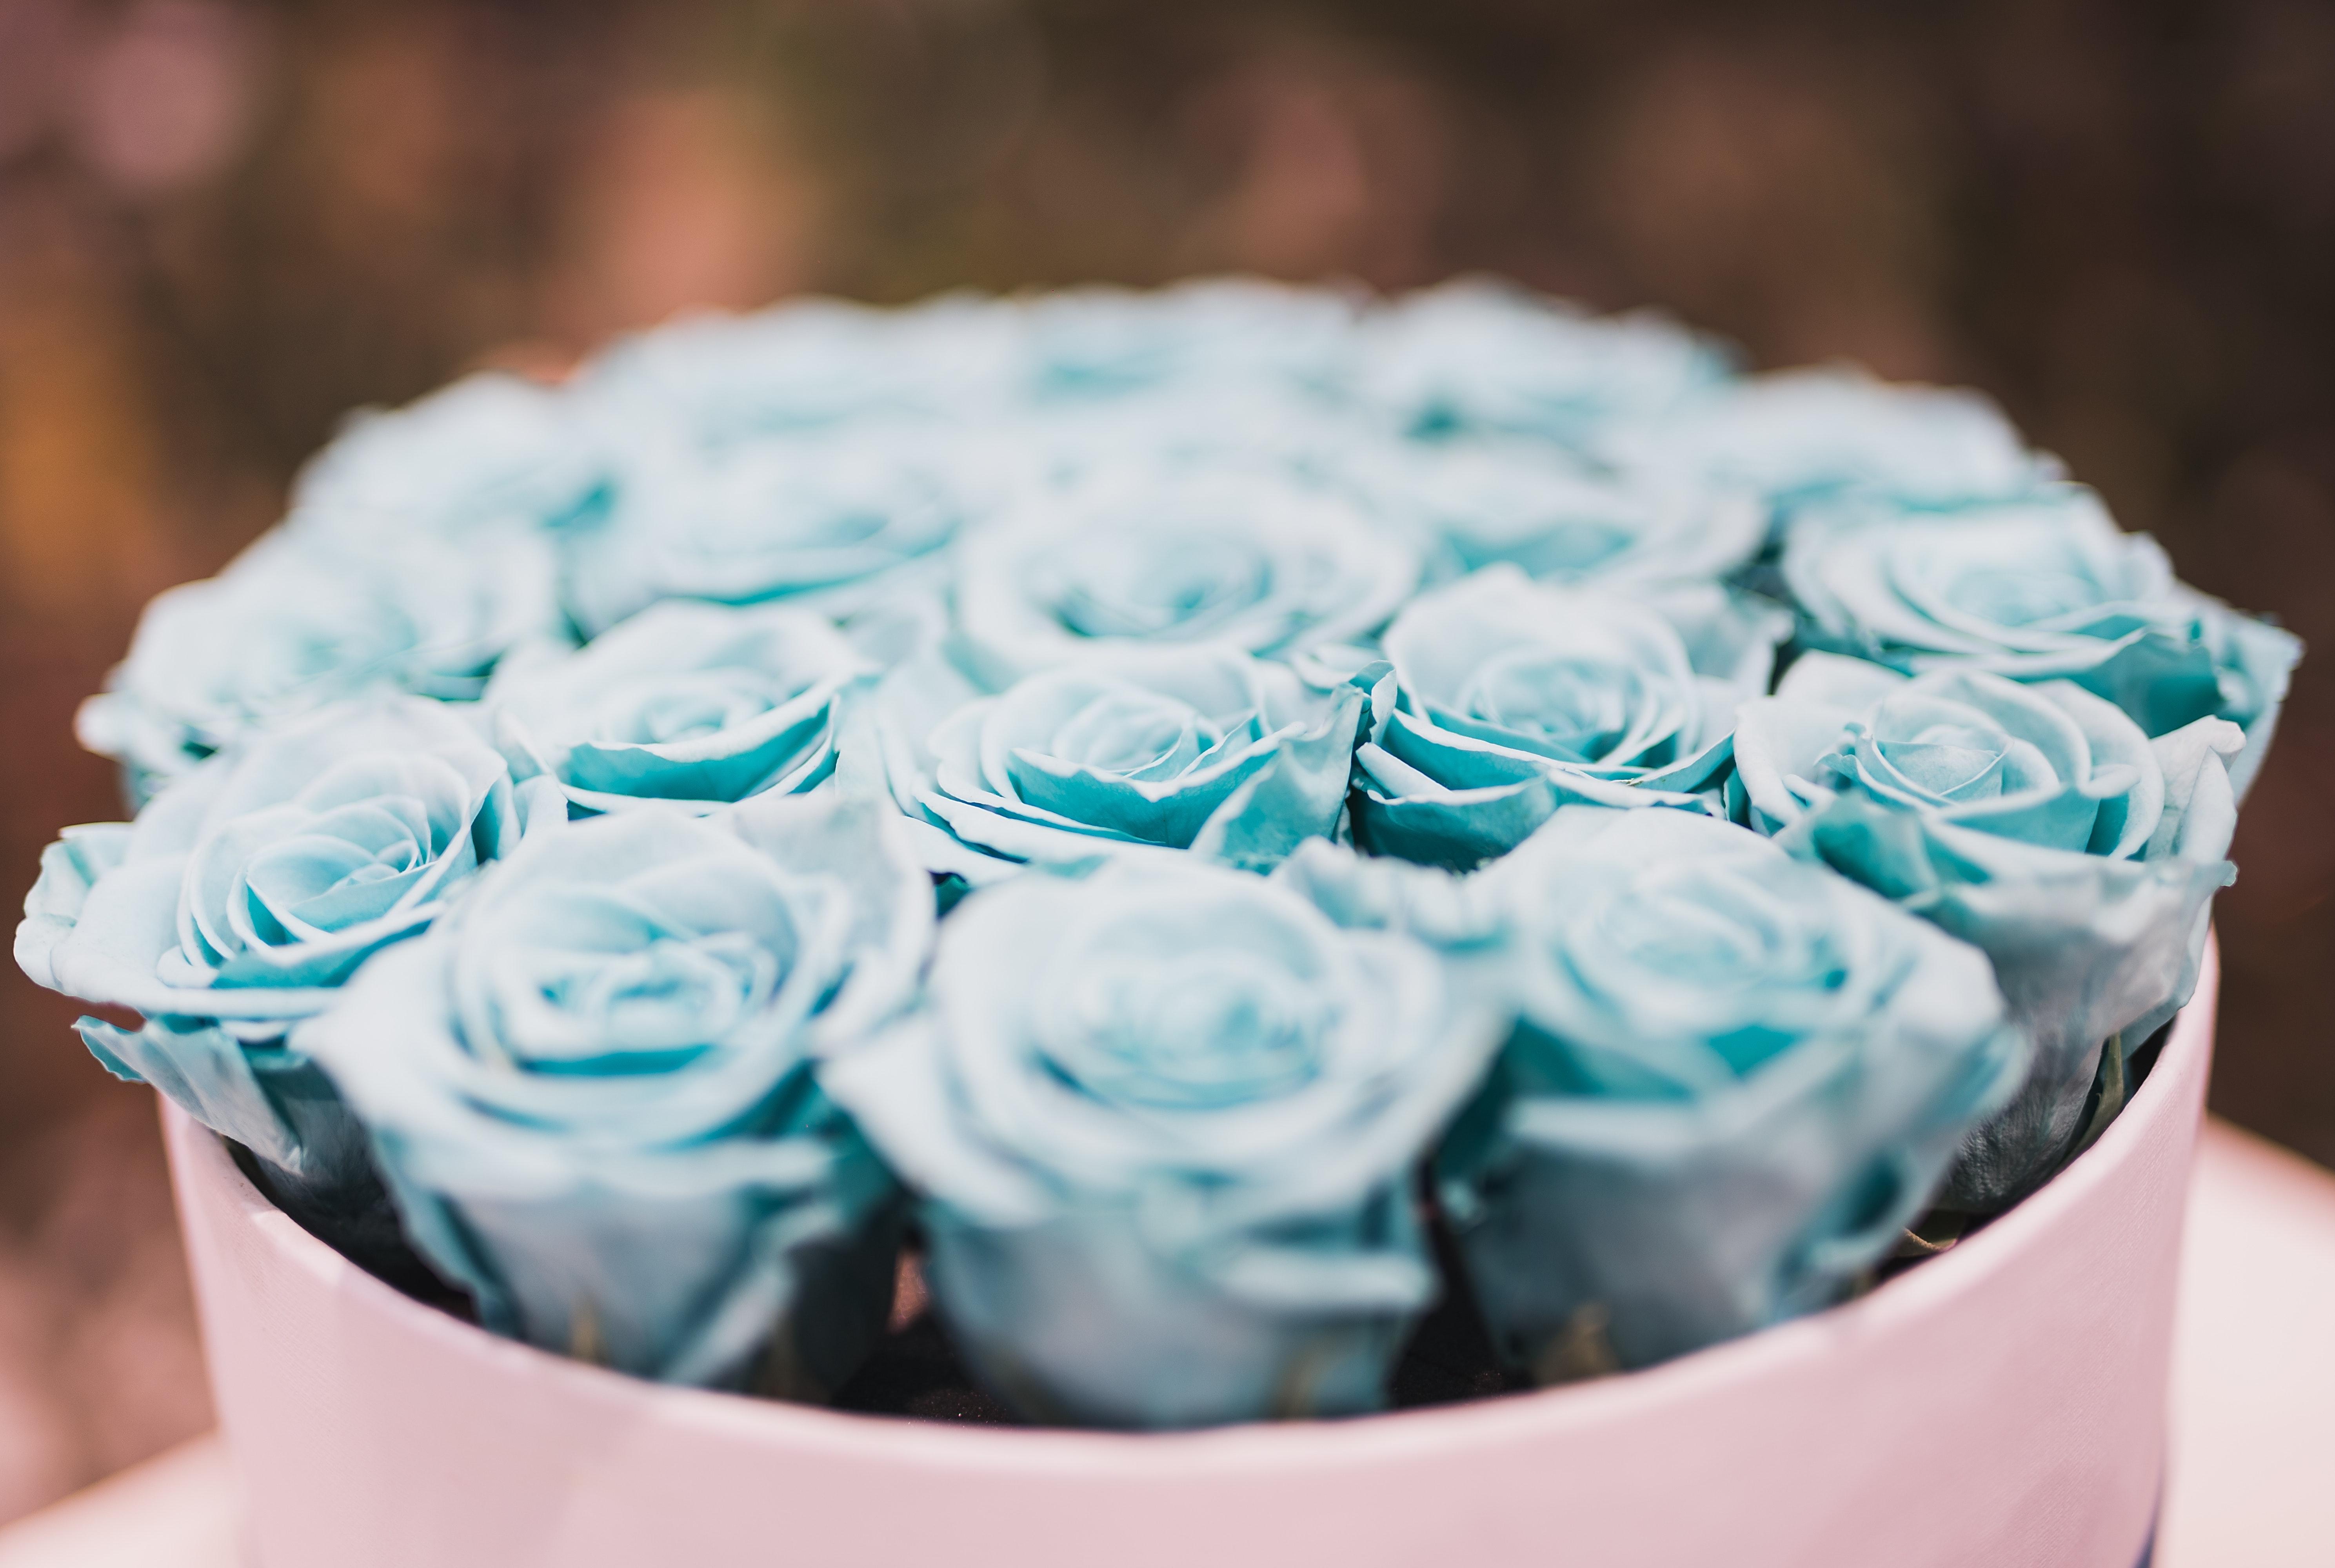 Blue Rose Bouquet Collections, Gift, Love, Petals, Romantic, HQ Photo